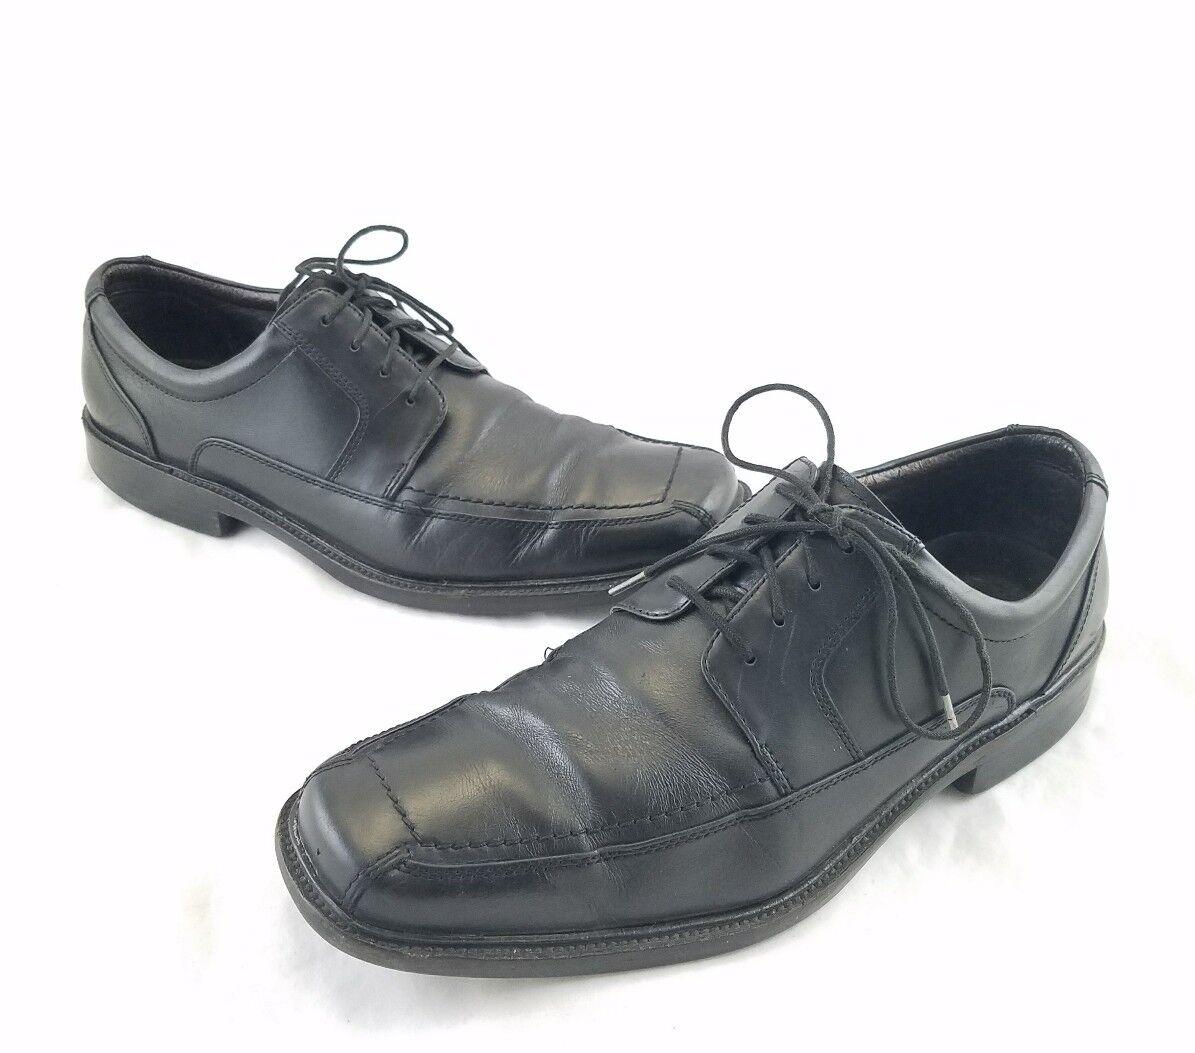 Johnston & Murphy Gambrill Black Leather Square Toe Oxfords 20-2161 Sz 10.5M C10